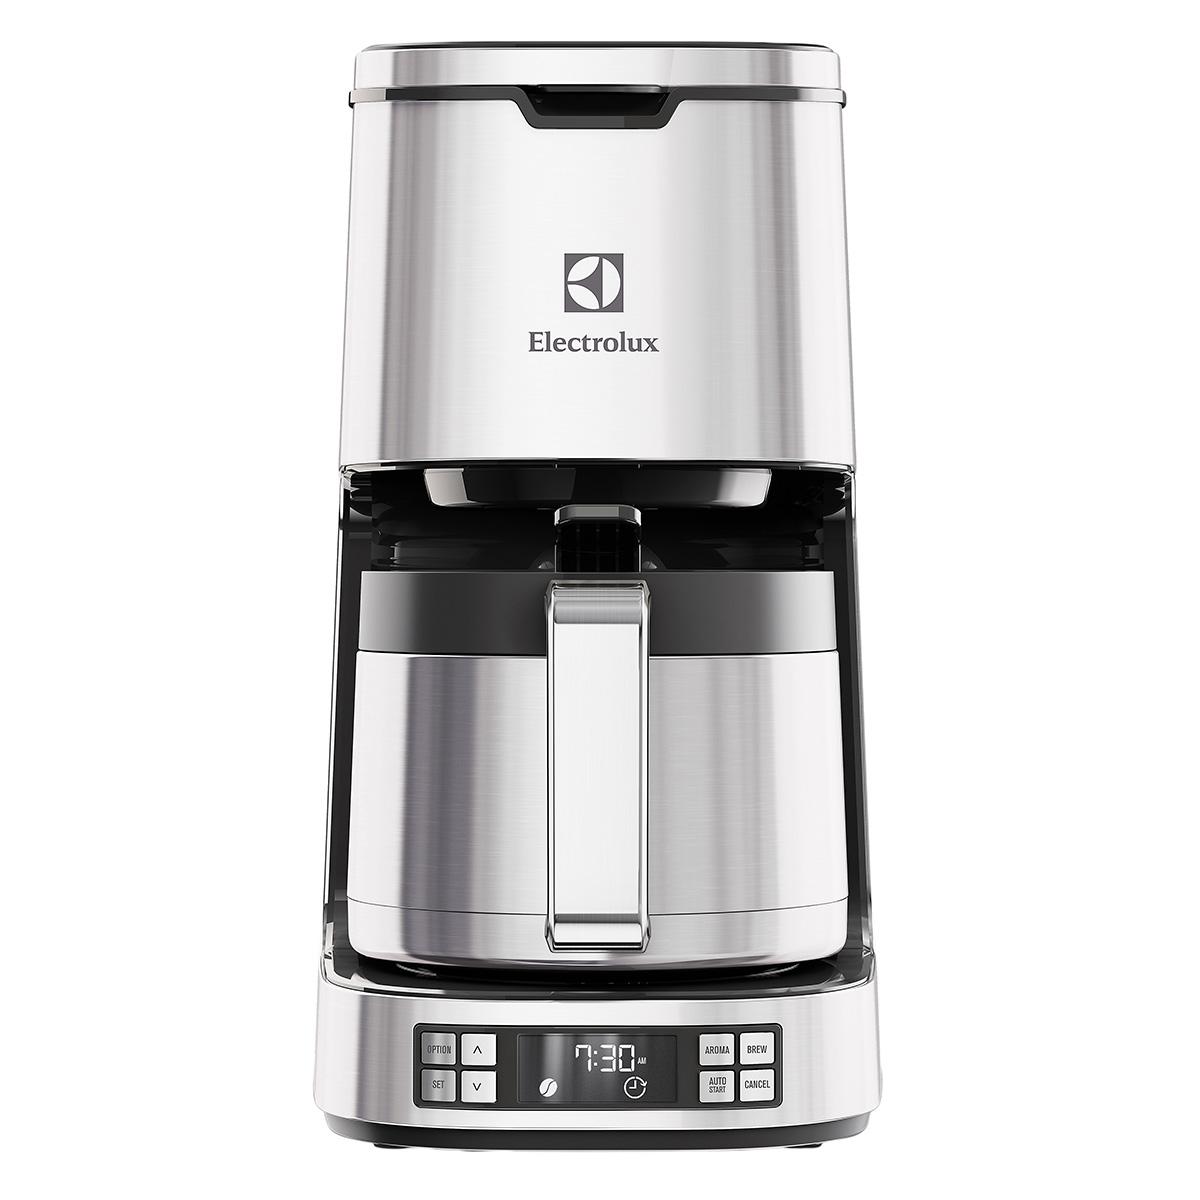 Image of   Electrolux kaffemaskine - EKF7900 - Rustfrit stål